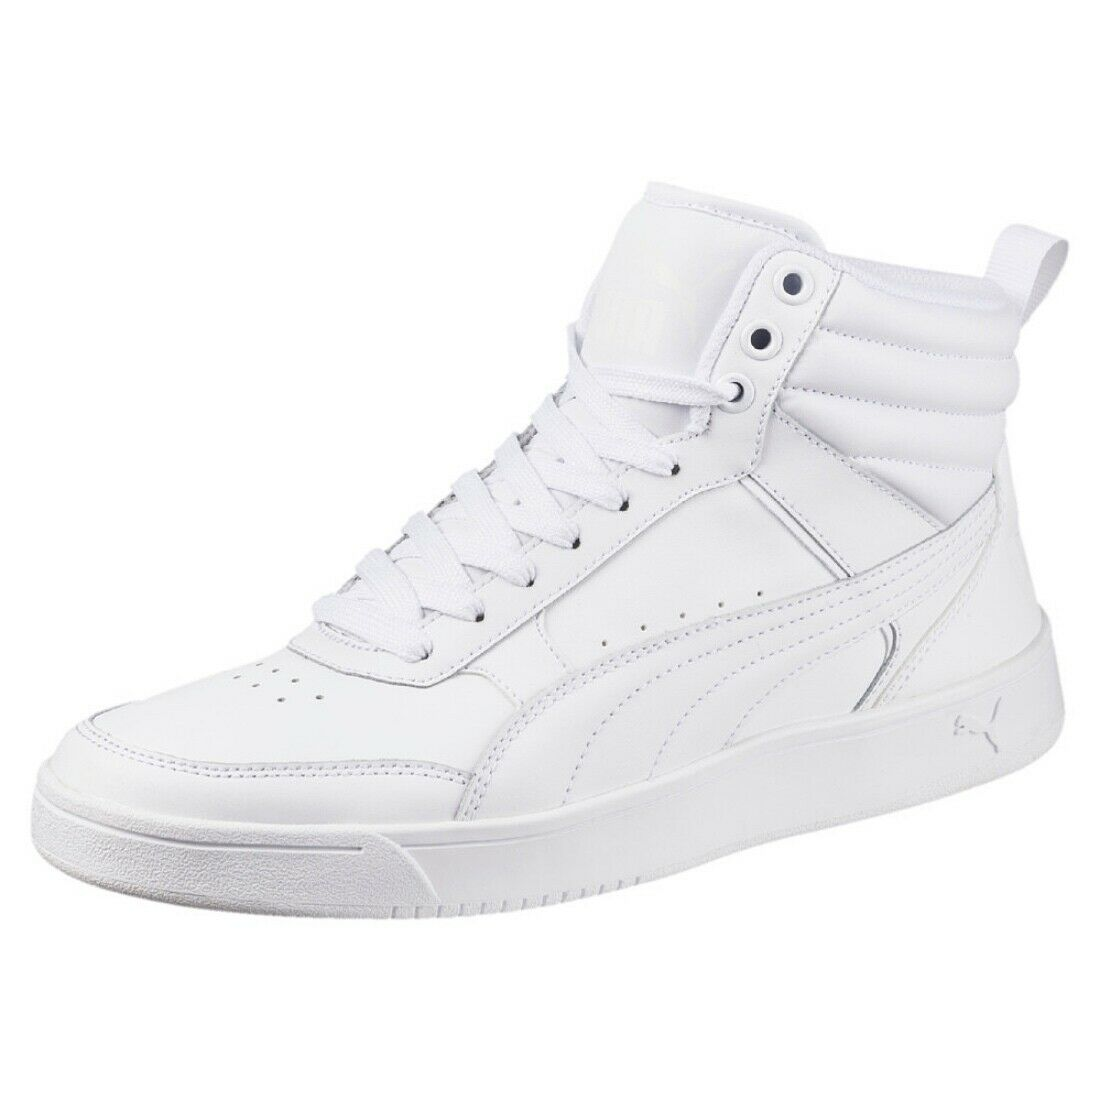 Puma Rebound Street v2 L Mid Shoes